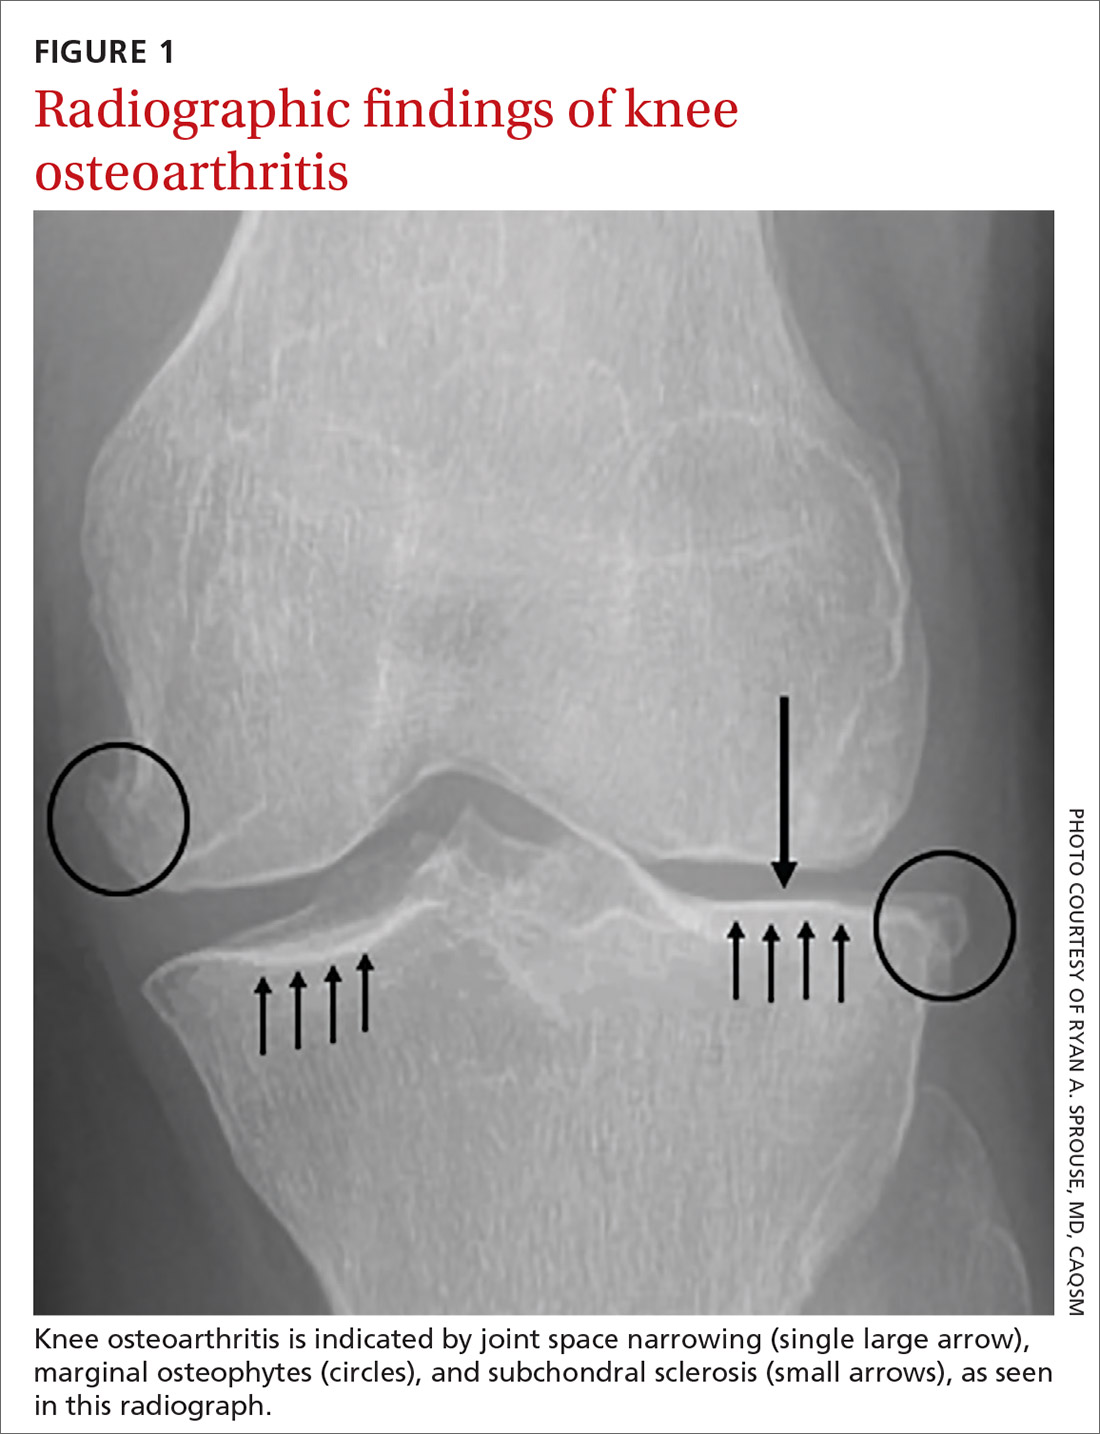 Radiographic findings of knee osteoarthritis